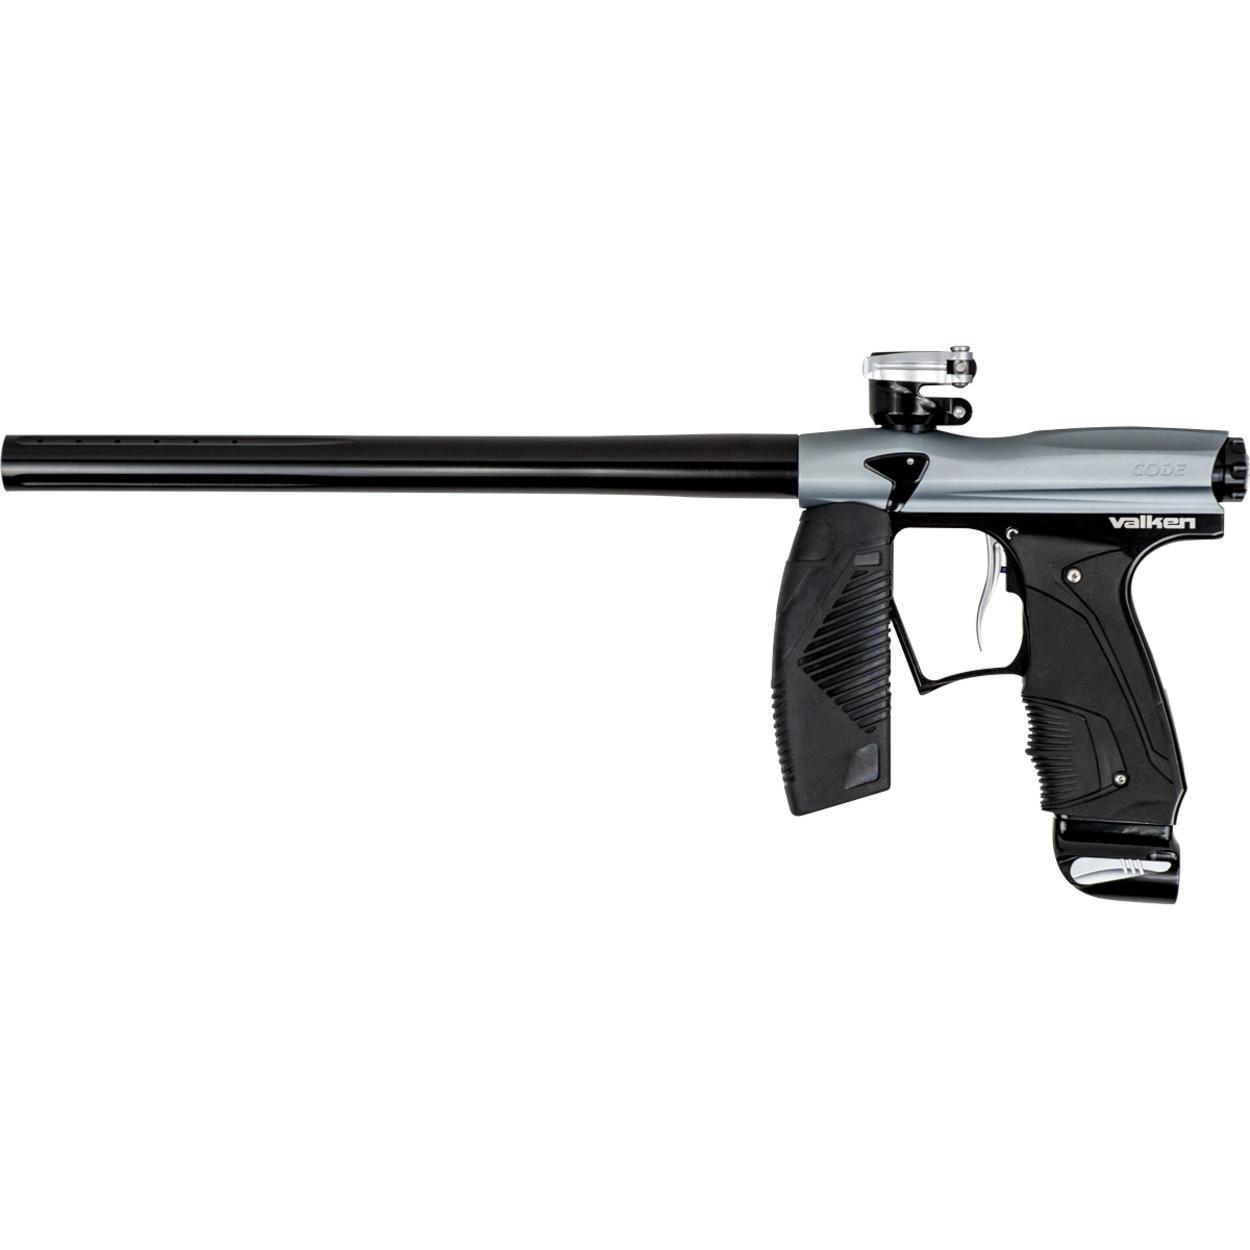 Valken Code Electronic Paintball Gun Cal. 68 - Titanum